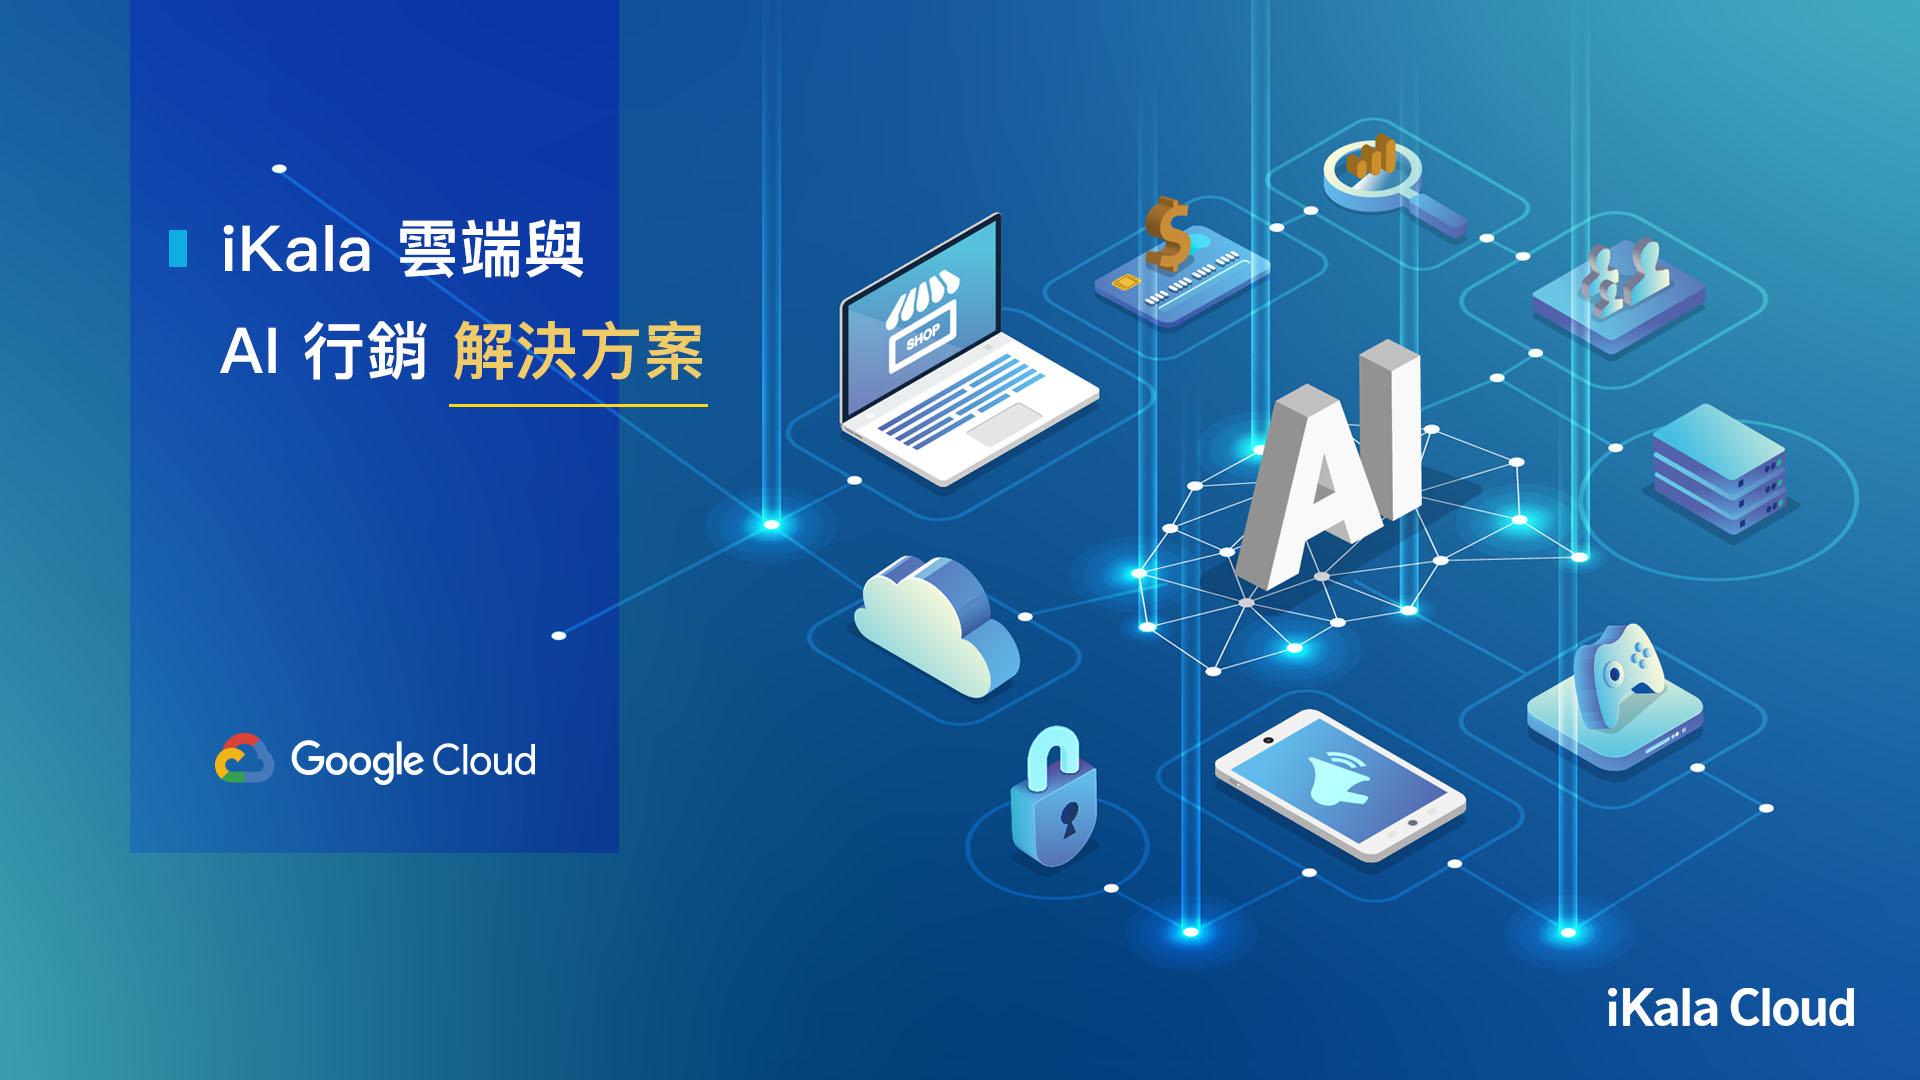 iKala 雲端與 AI 行銷解決方案